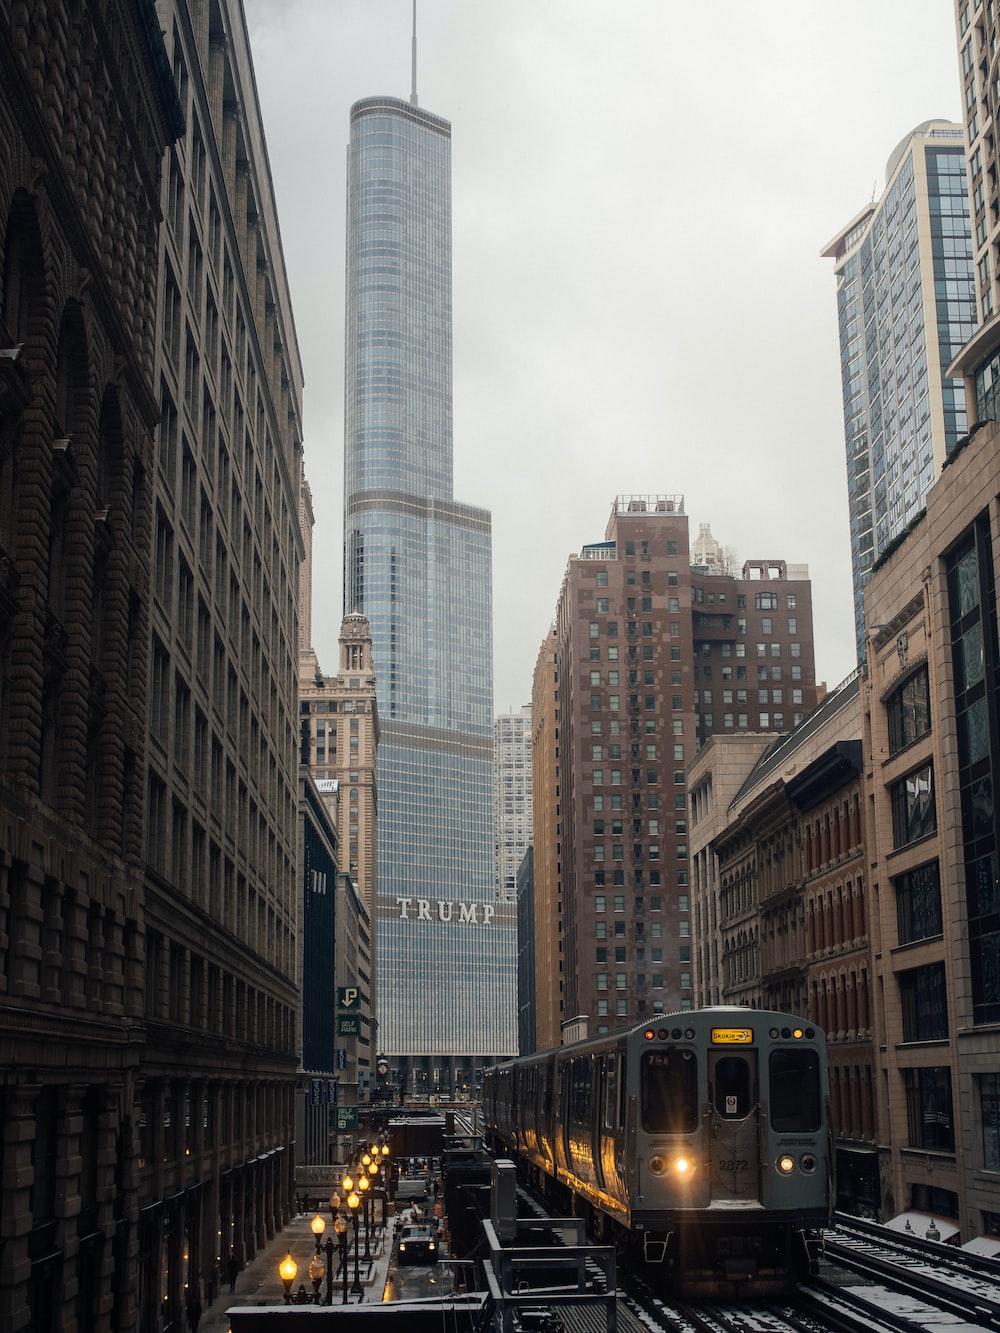 grey train beside buildings